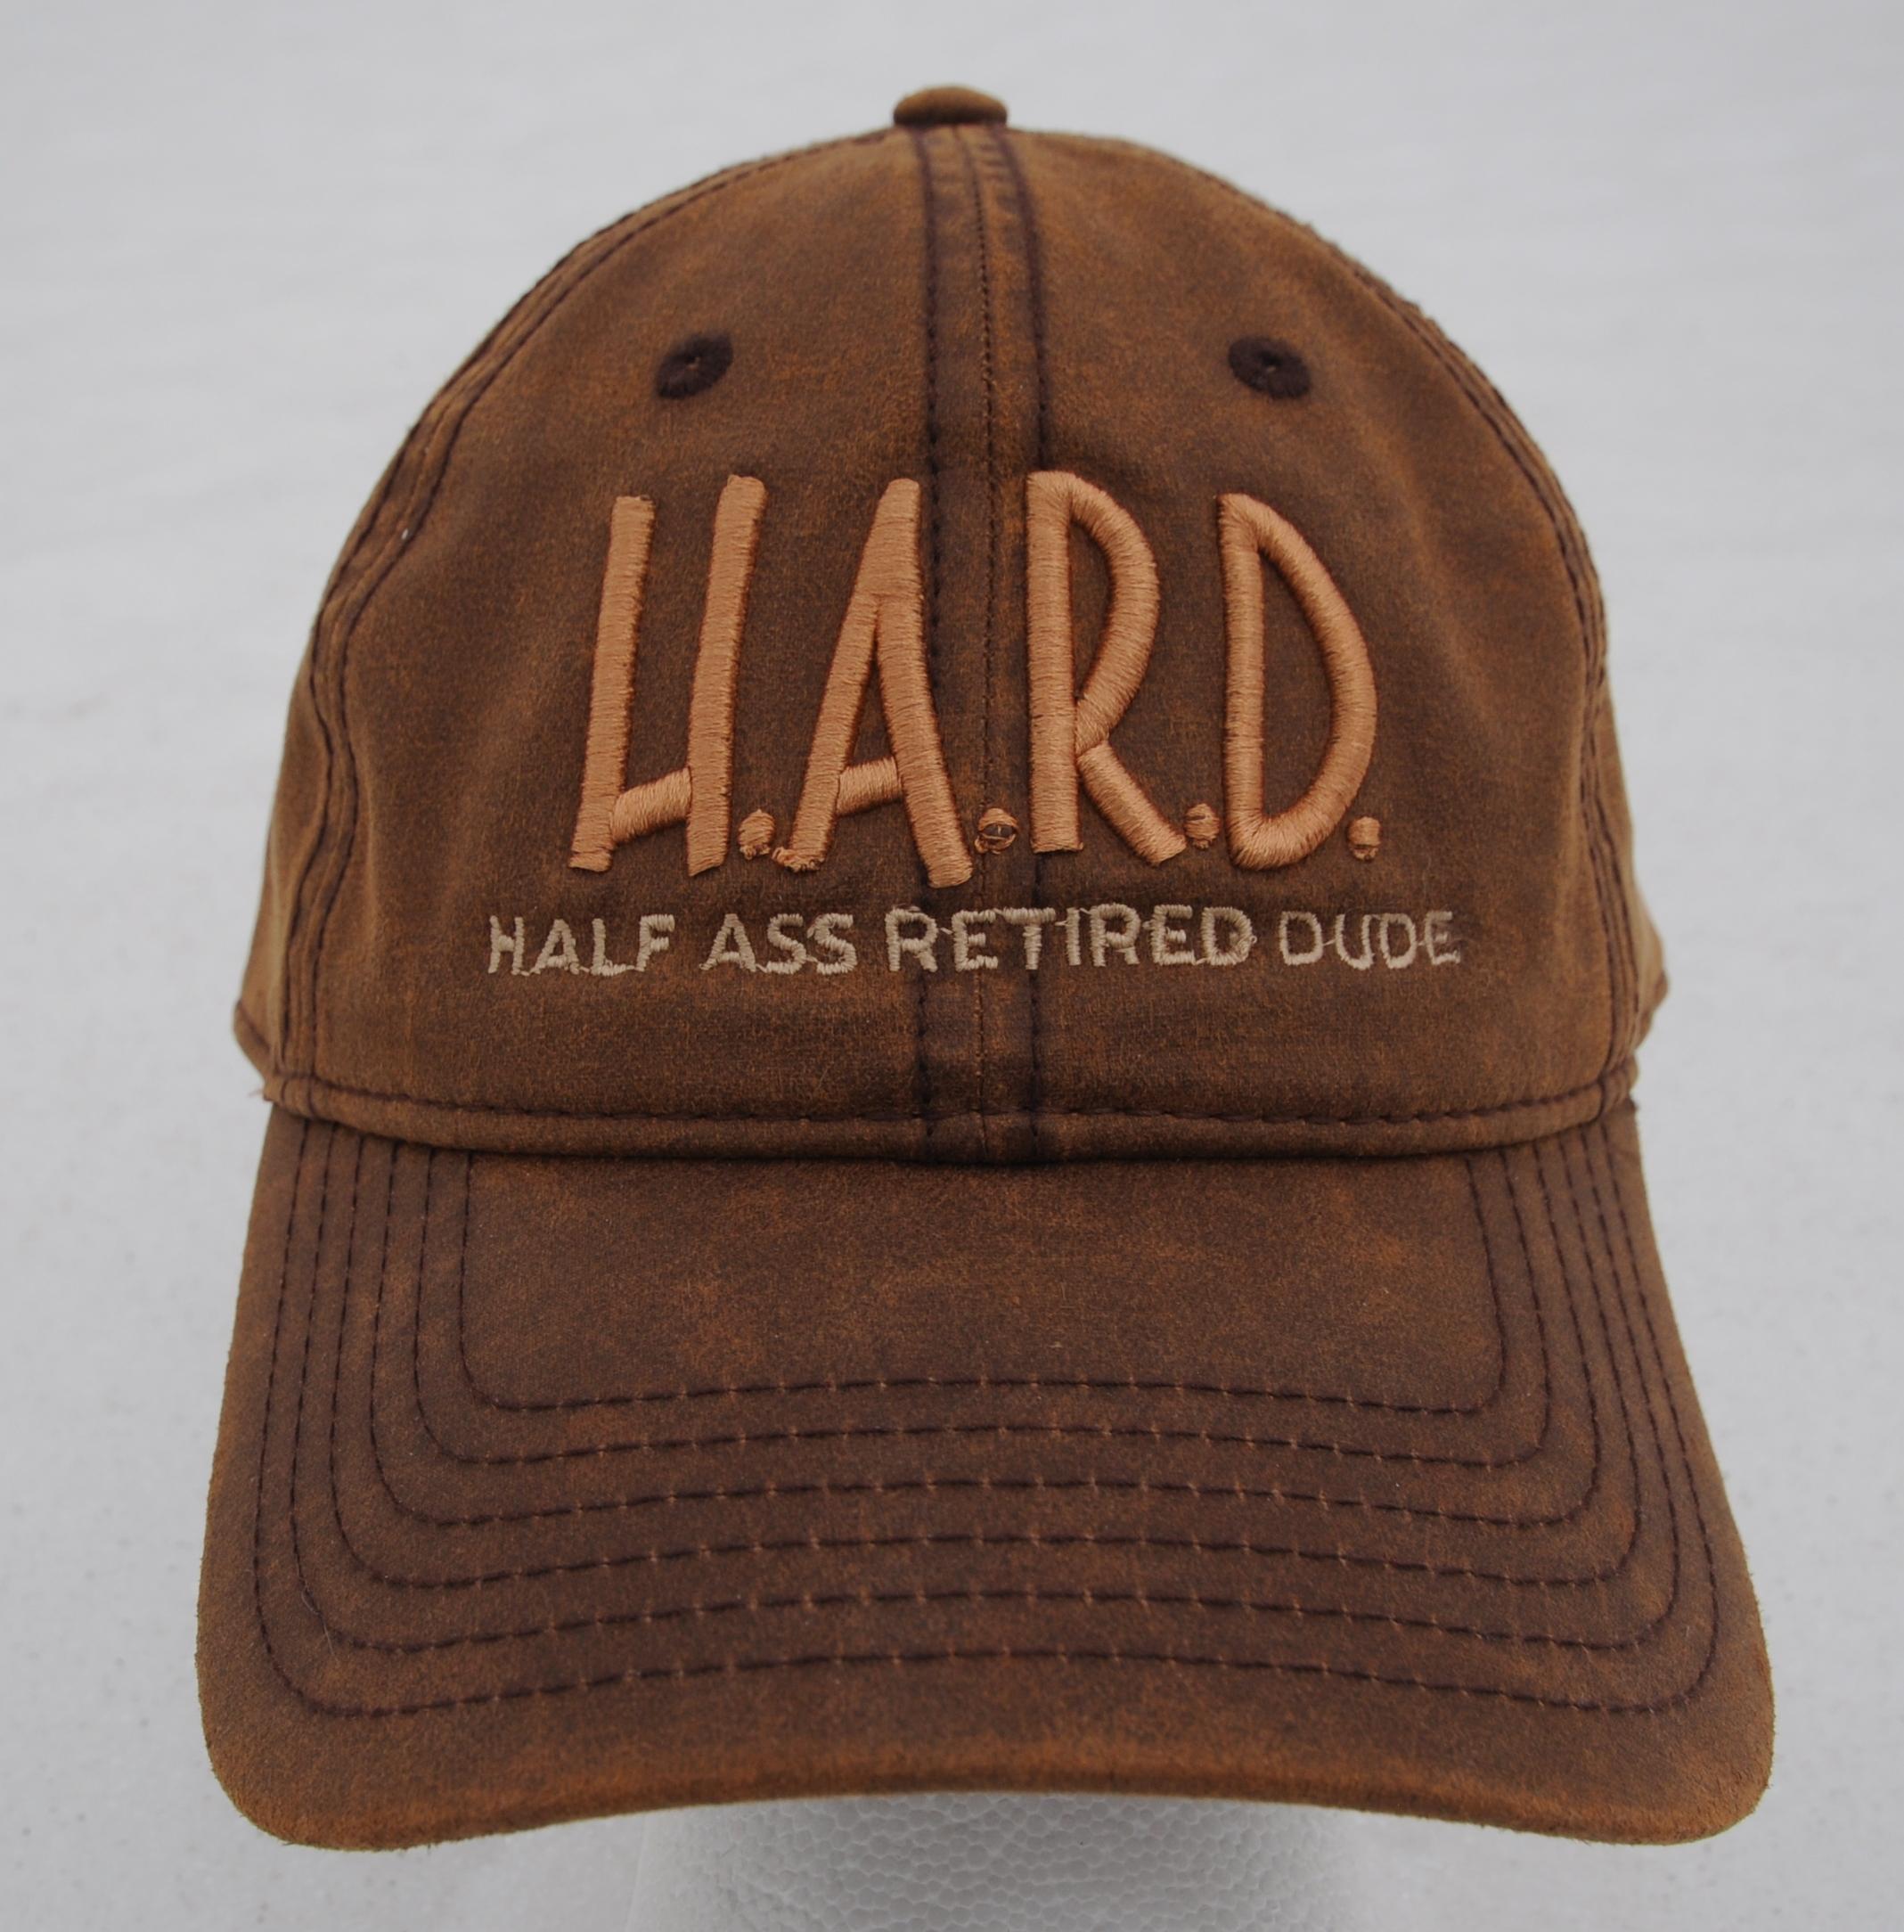 half ass retired dude brown hat